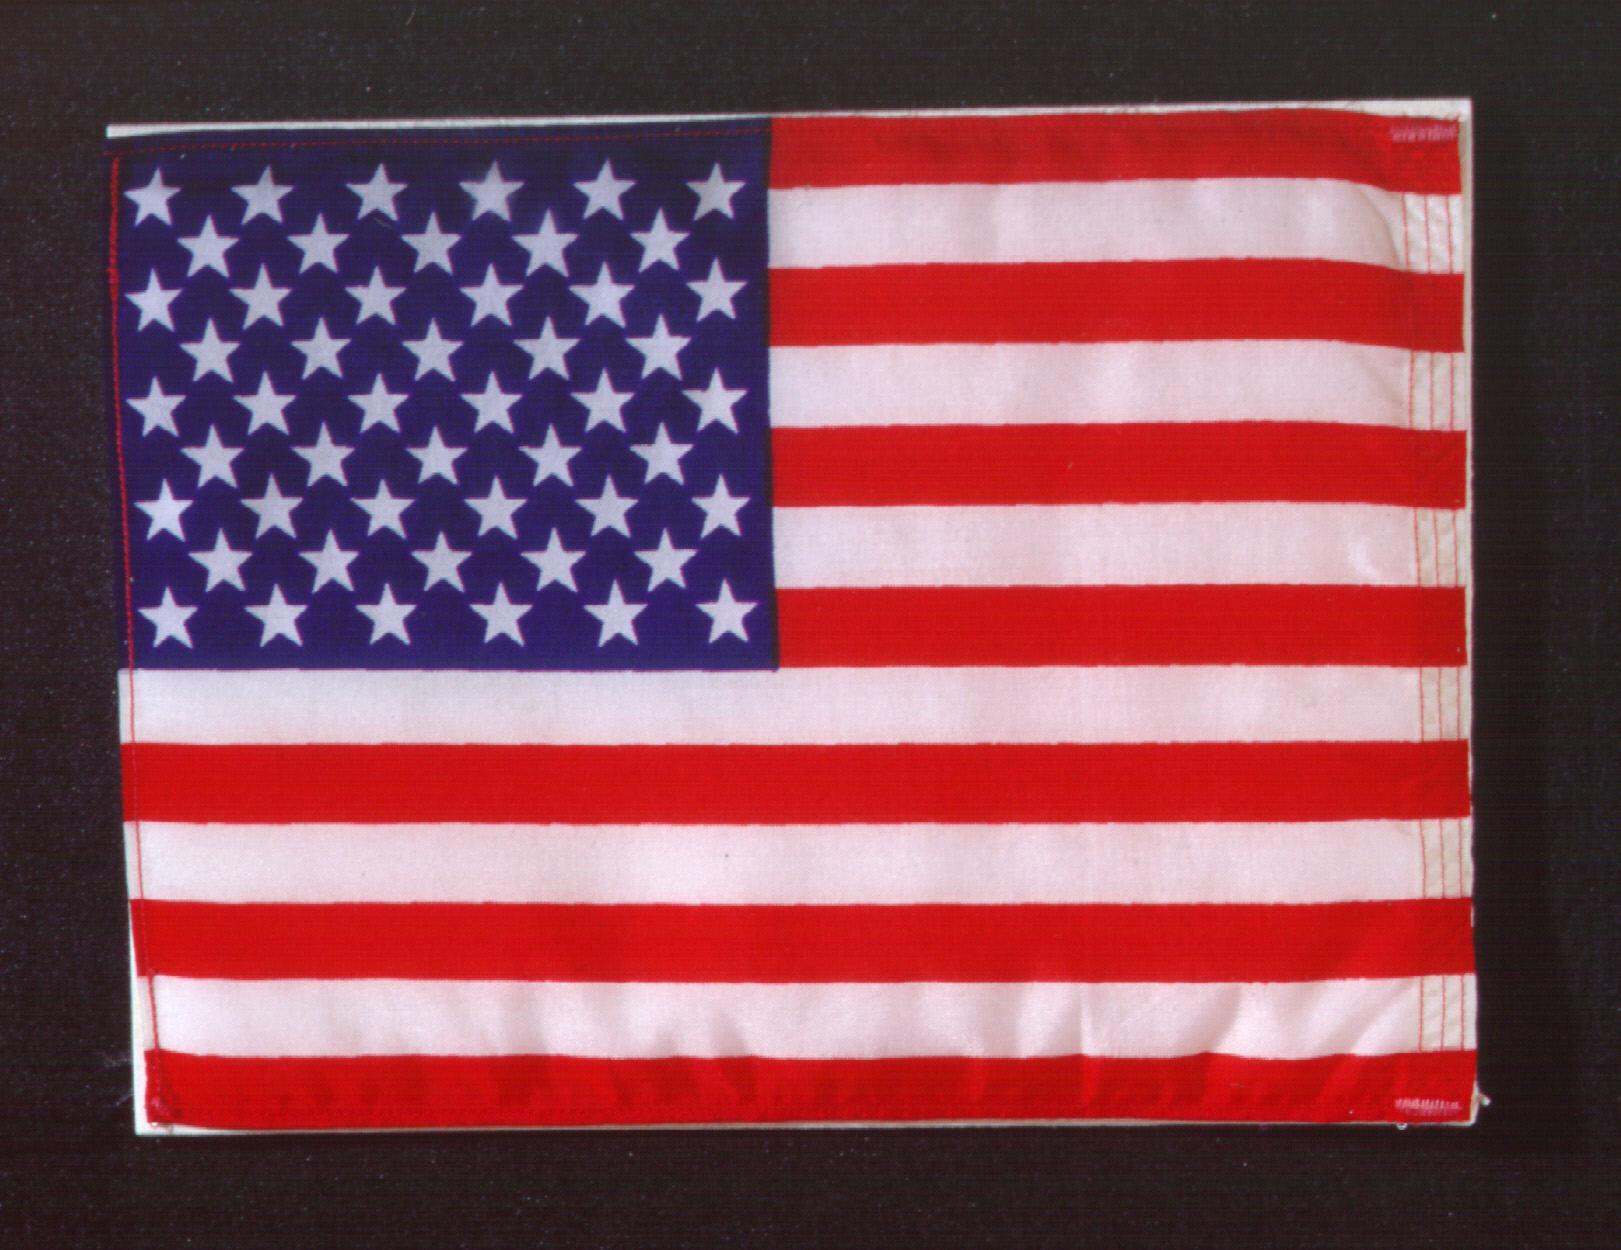 Apollo-Soyuz U.S. Flag